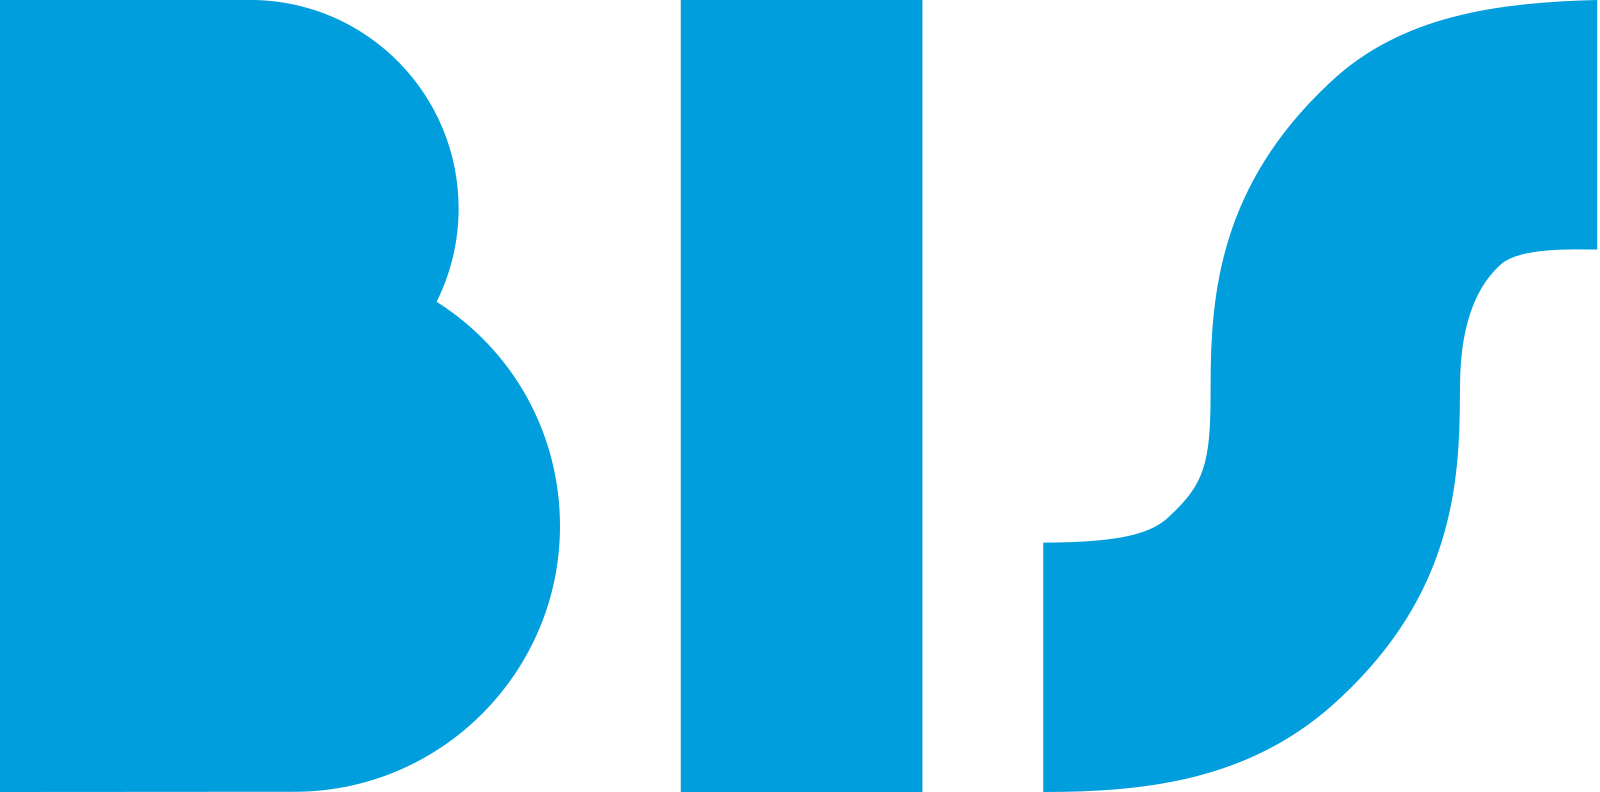 canal bis logo 5 - Canal Bis Logo